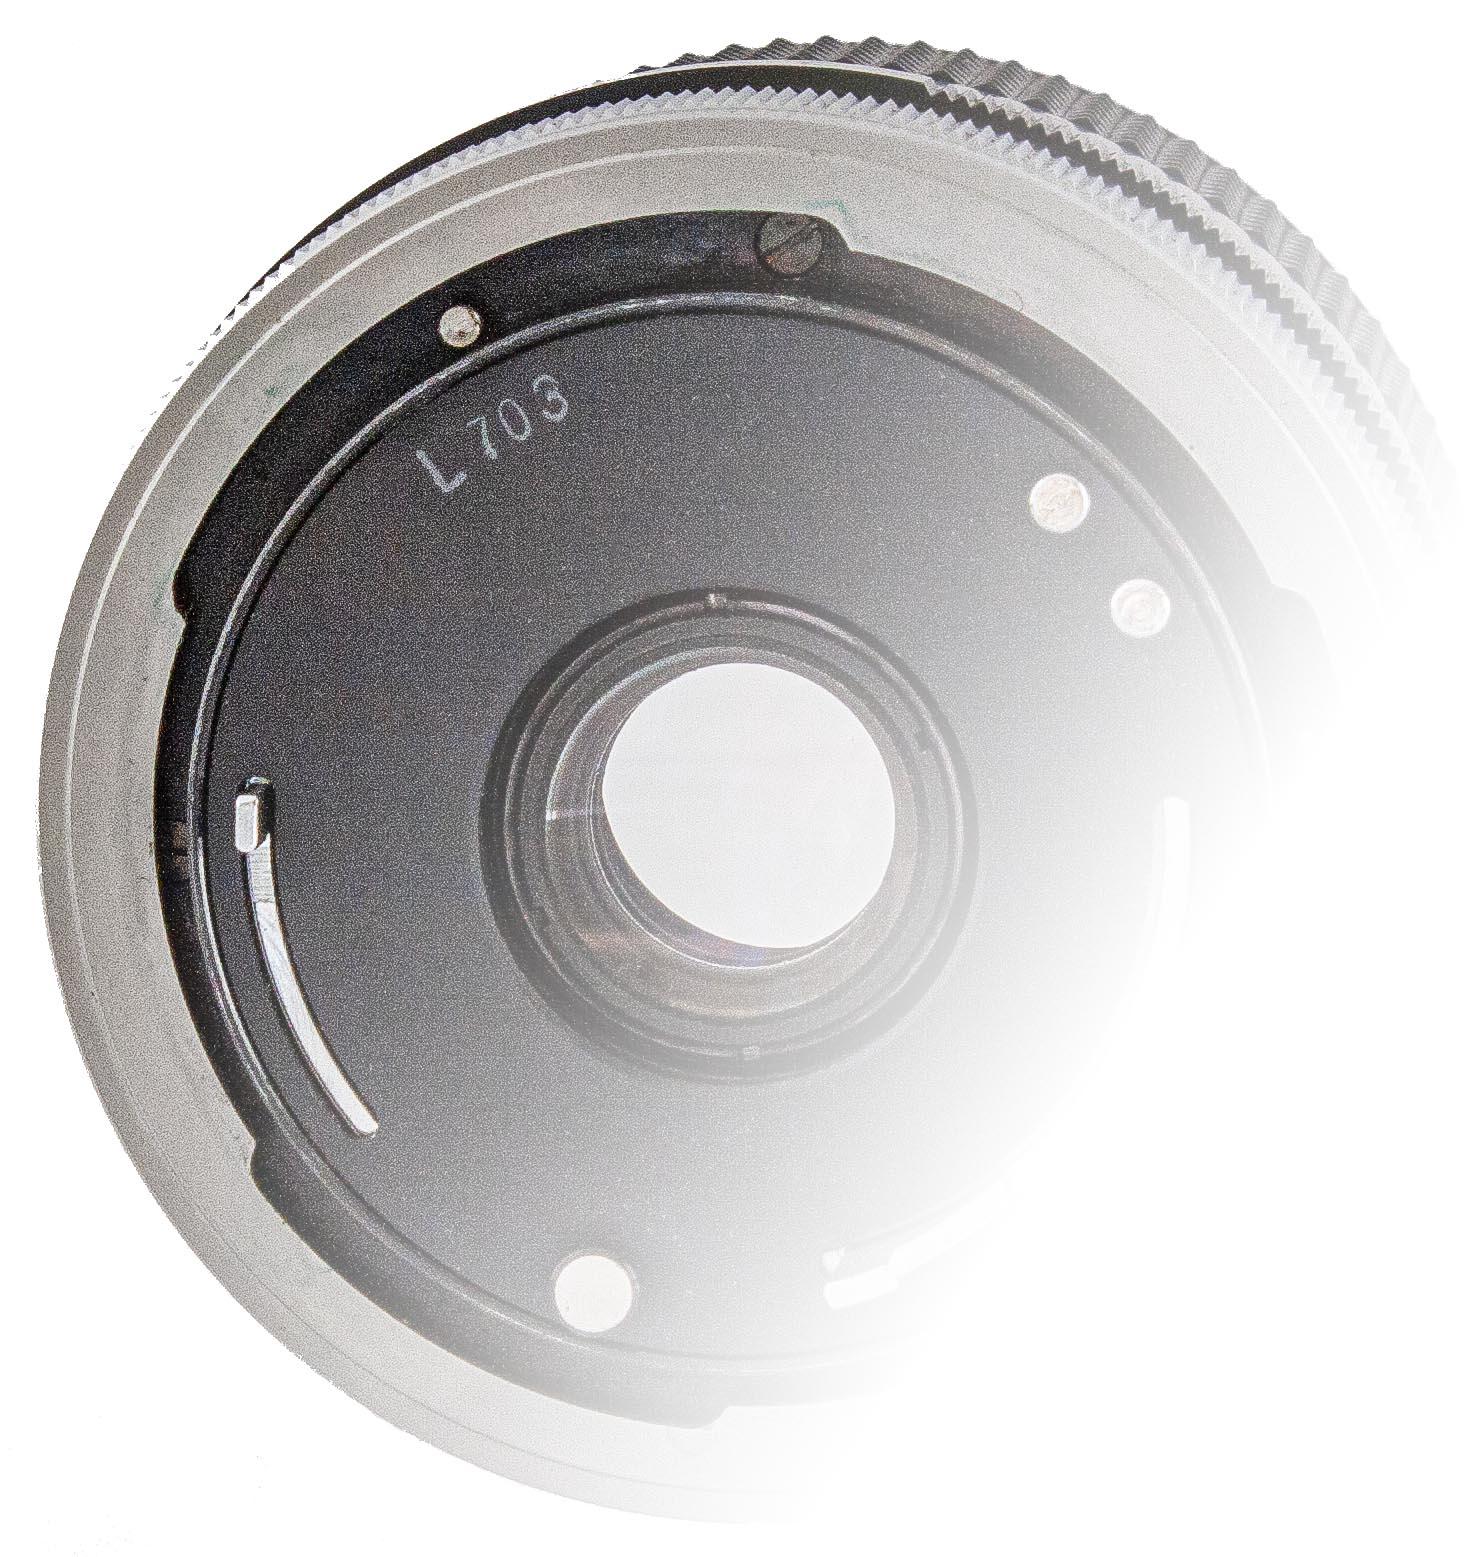 Canon AE-1 Program (Silver)